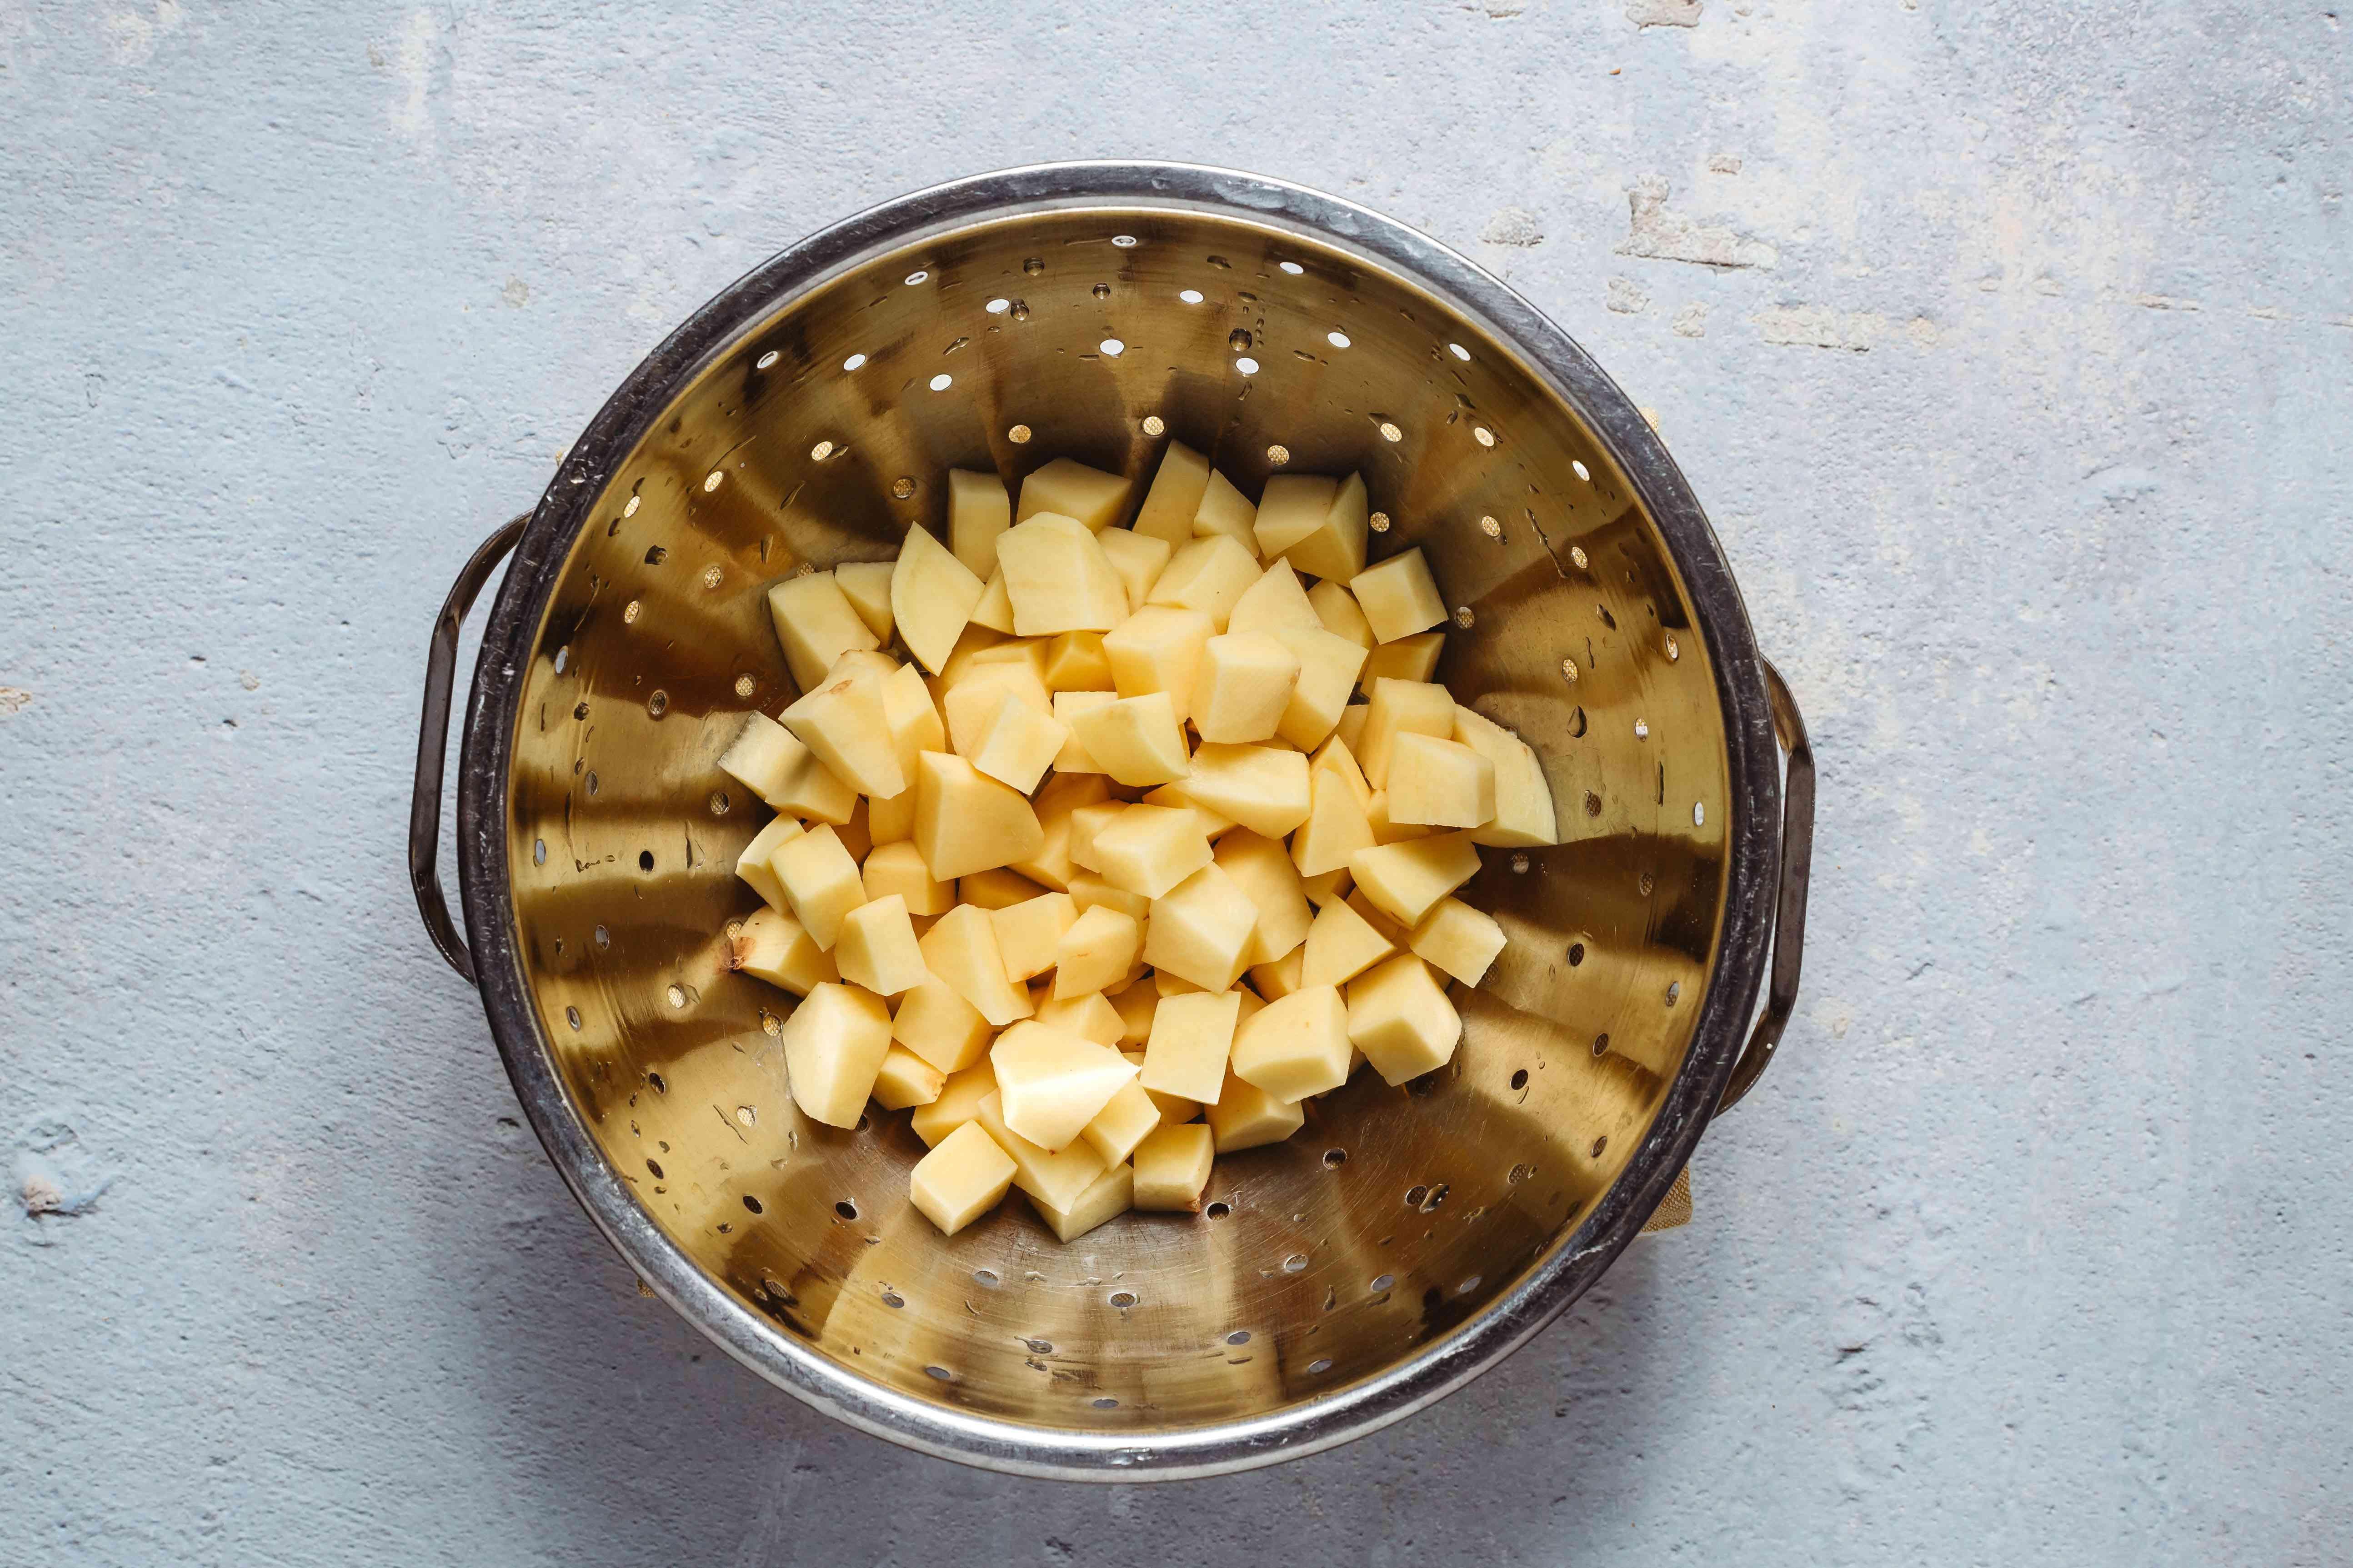 Wash and peel potatoes